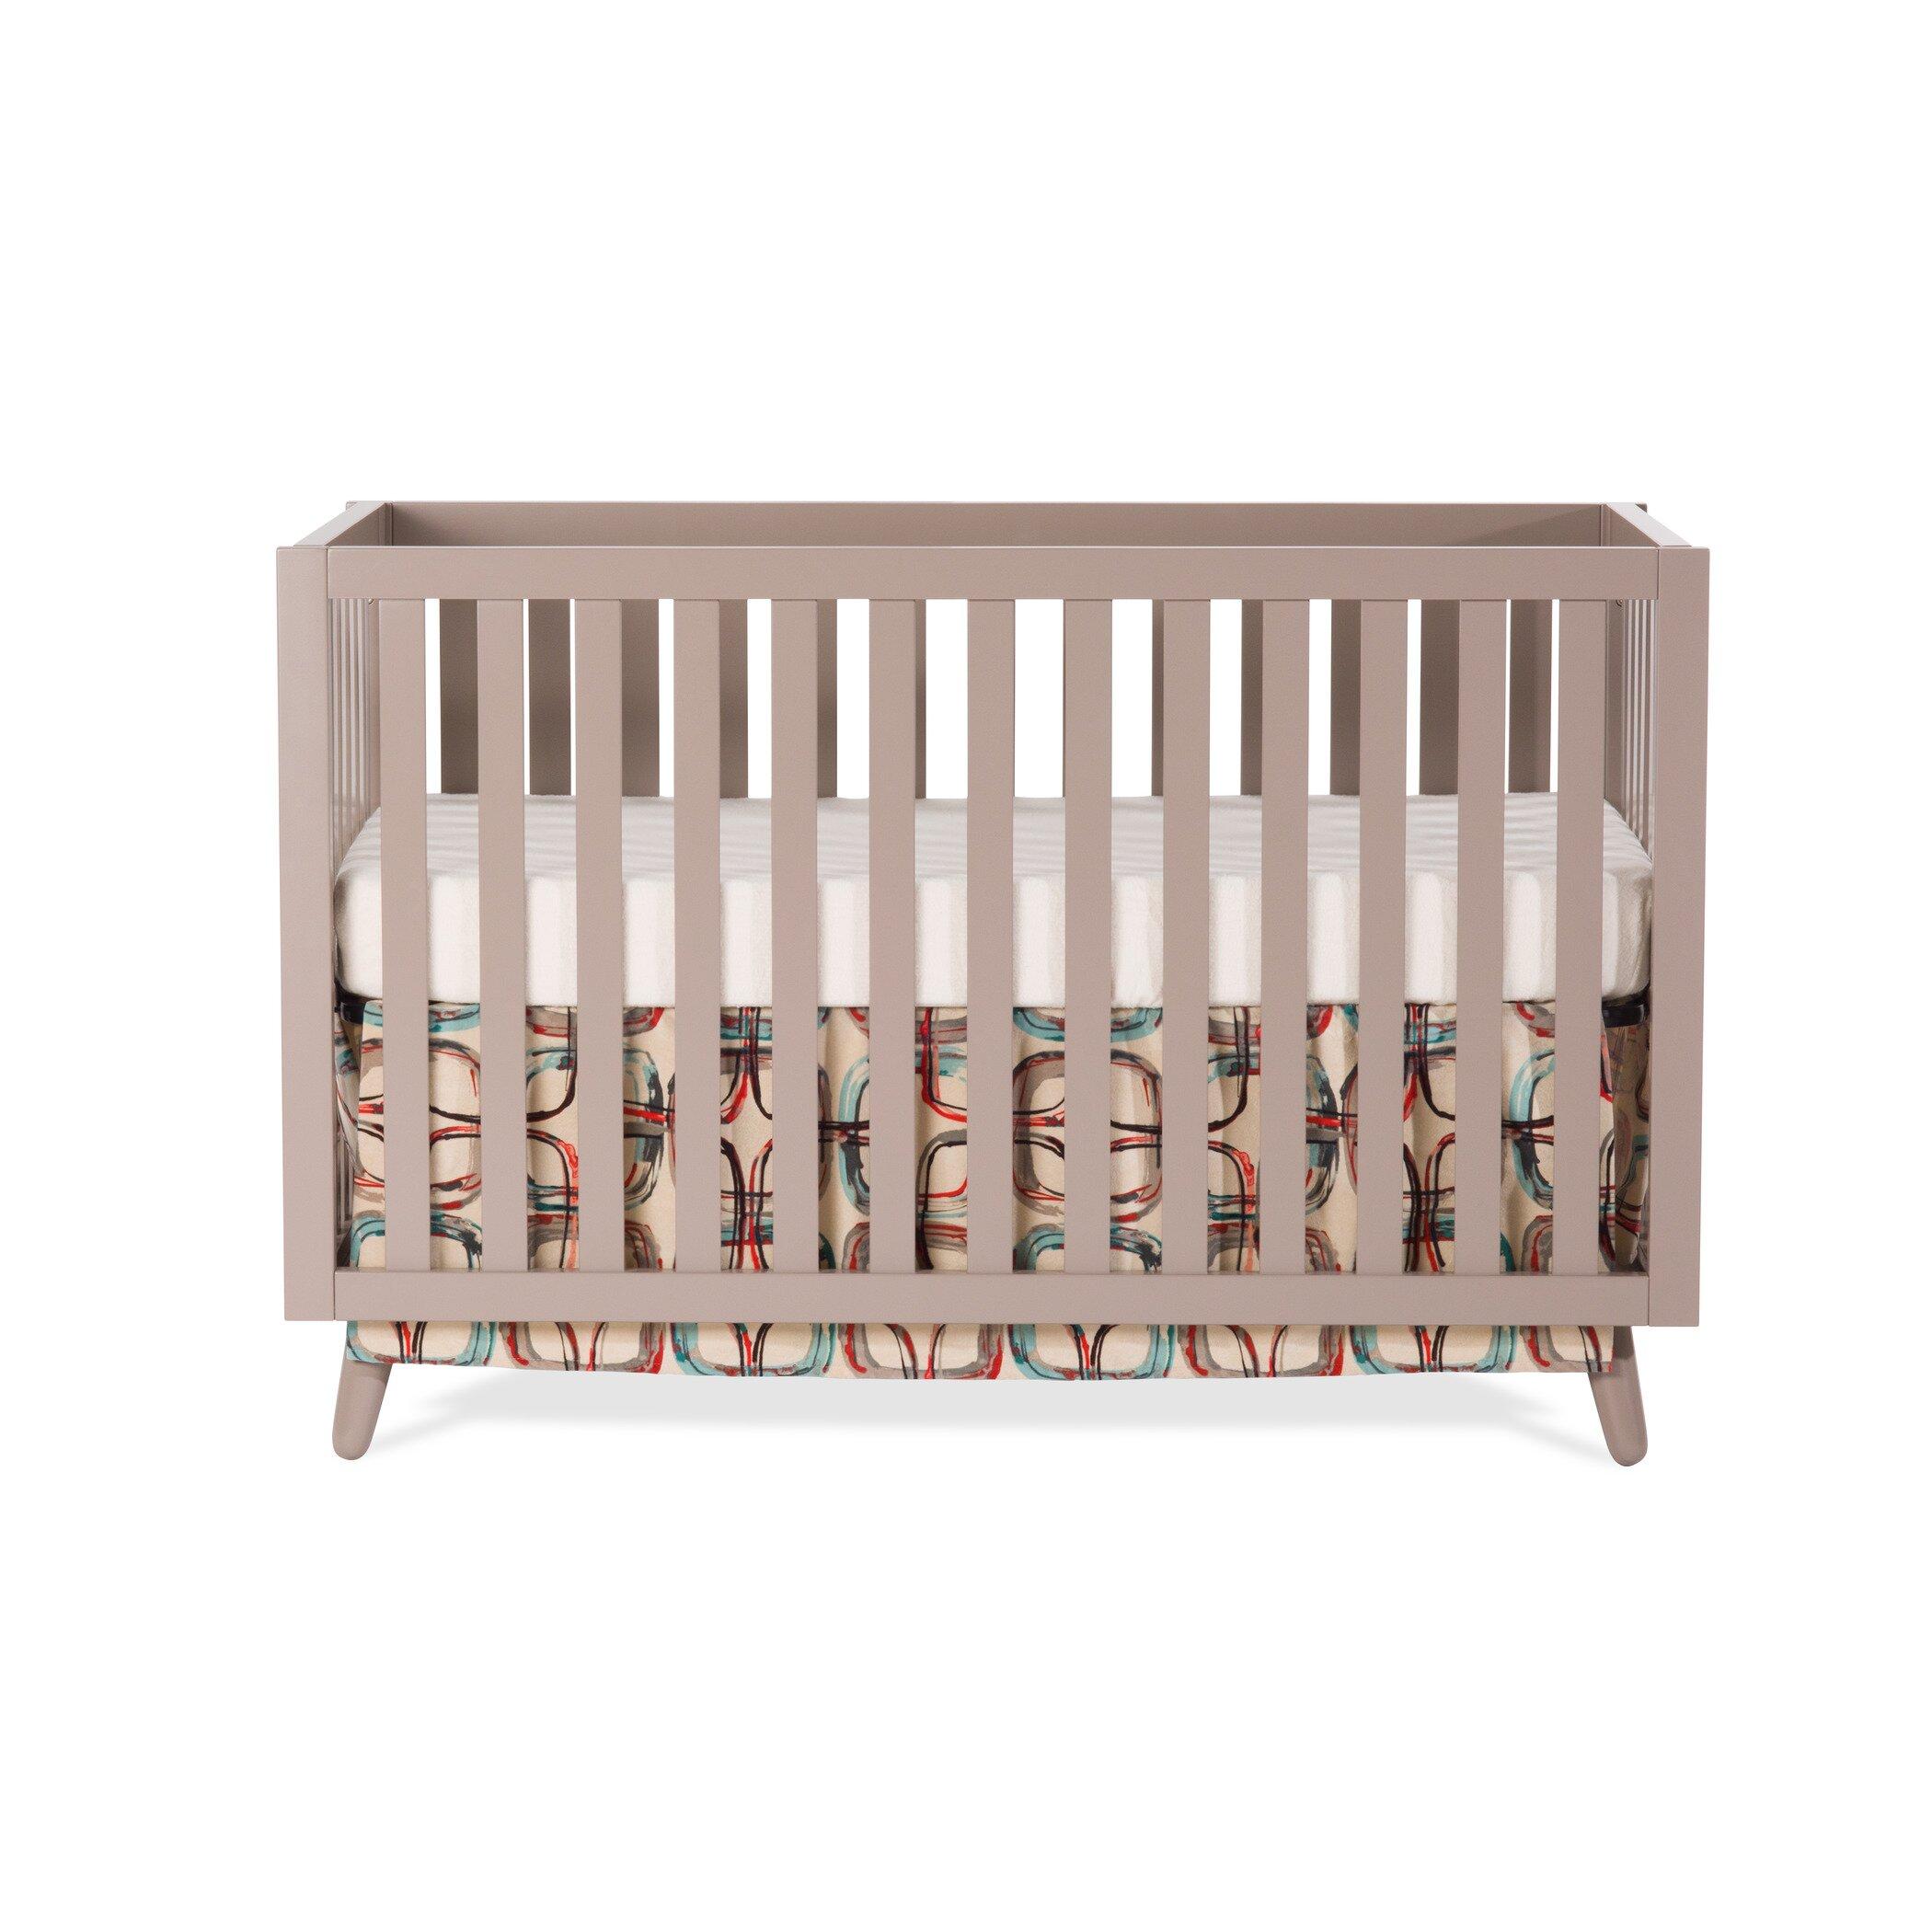 Child craft coventry crib - Child Craft Camden 4 In 1 Convertible Crib Child Craft Coventry Crib Reviews Child Craft